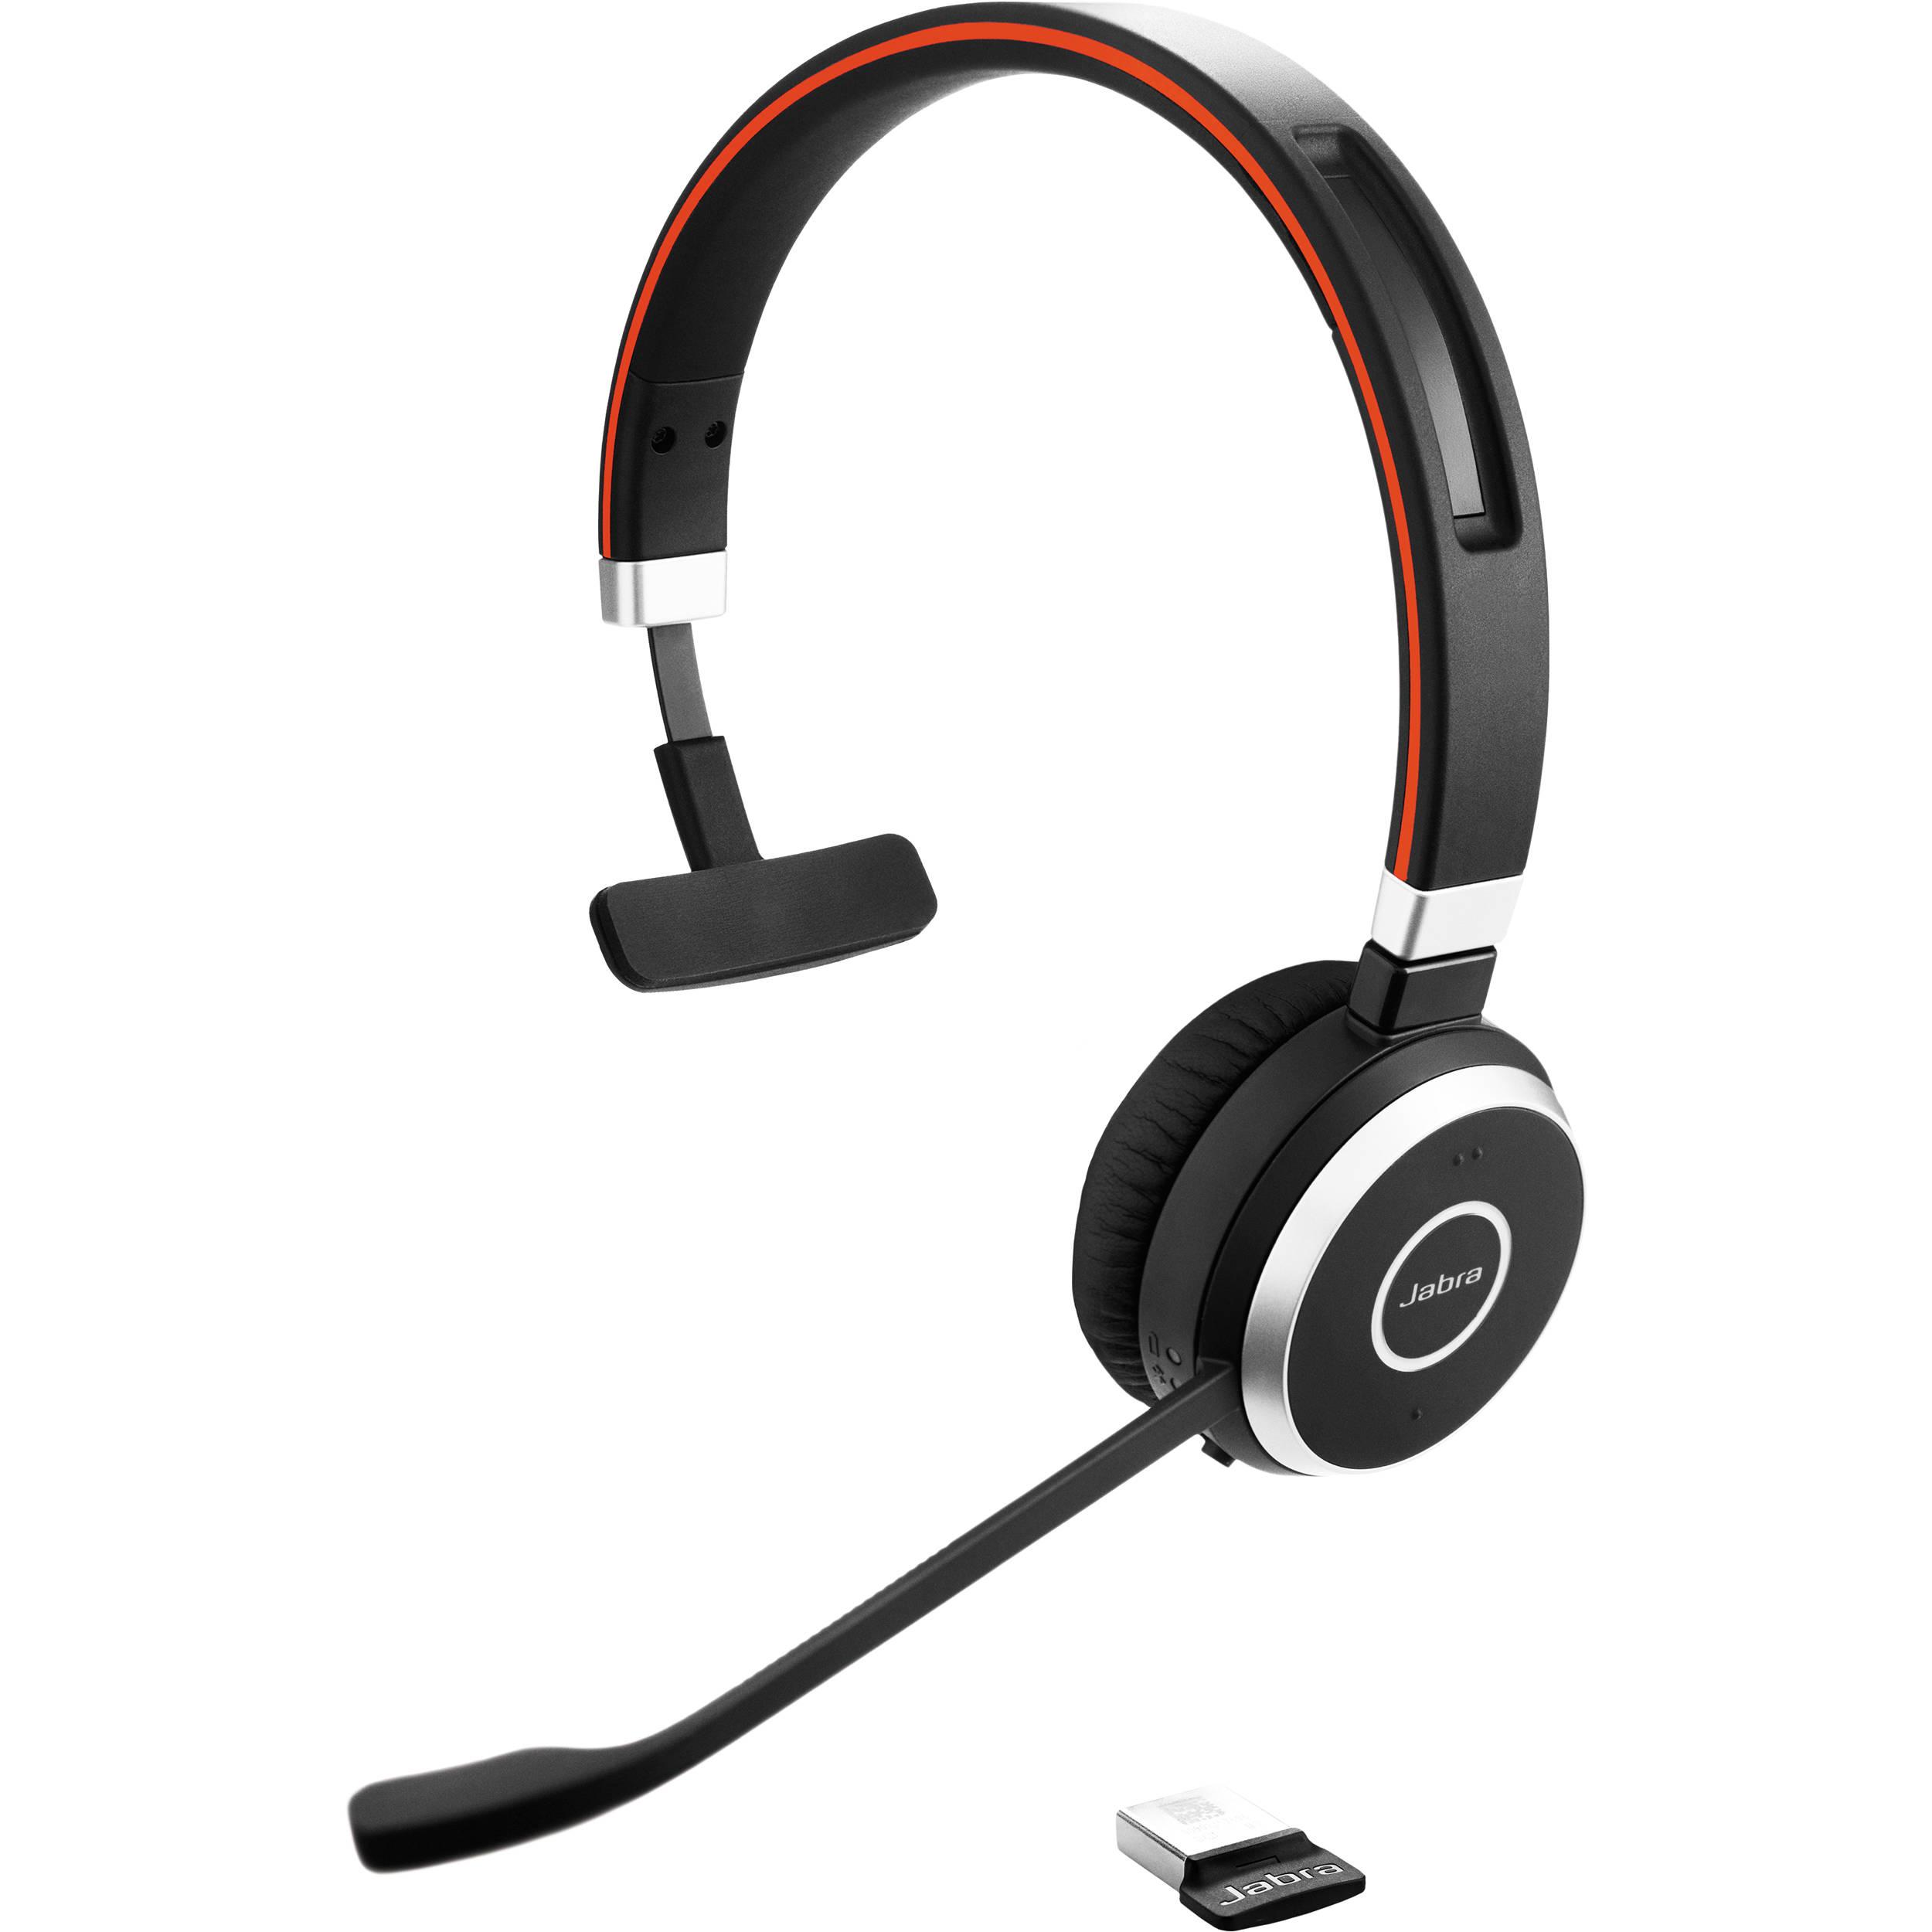 Jabra EVOLVE 65 UC Mono Bluetooth Headset 6593-829-409 B&H Photo